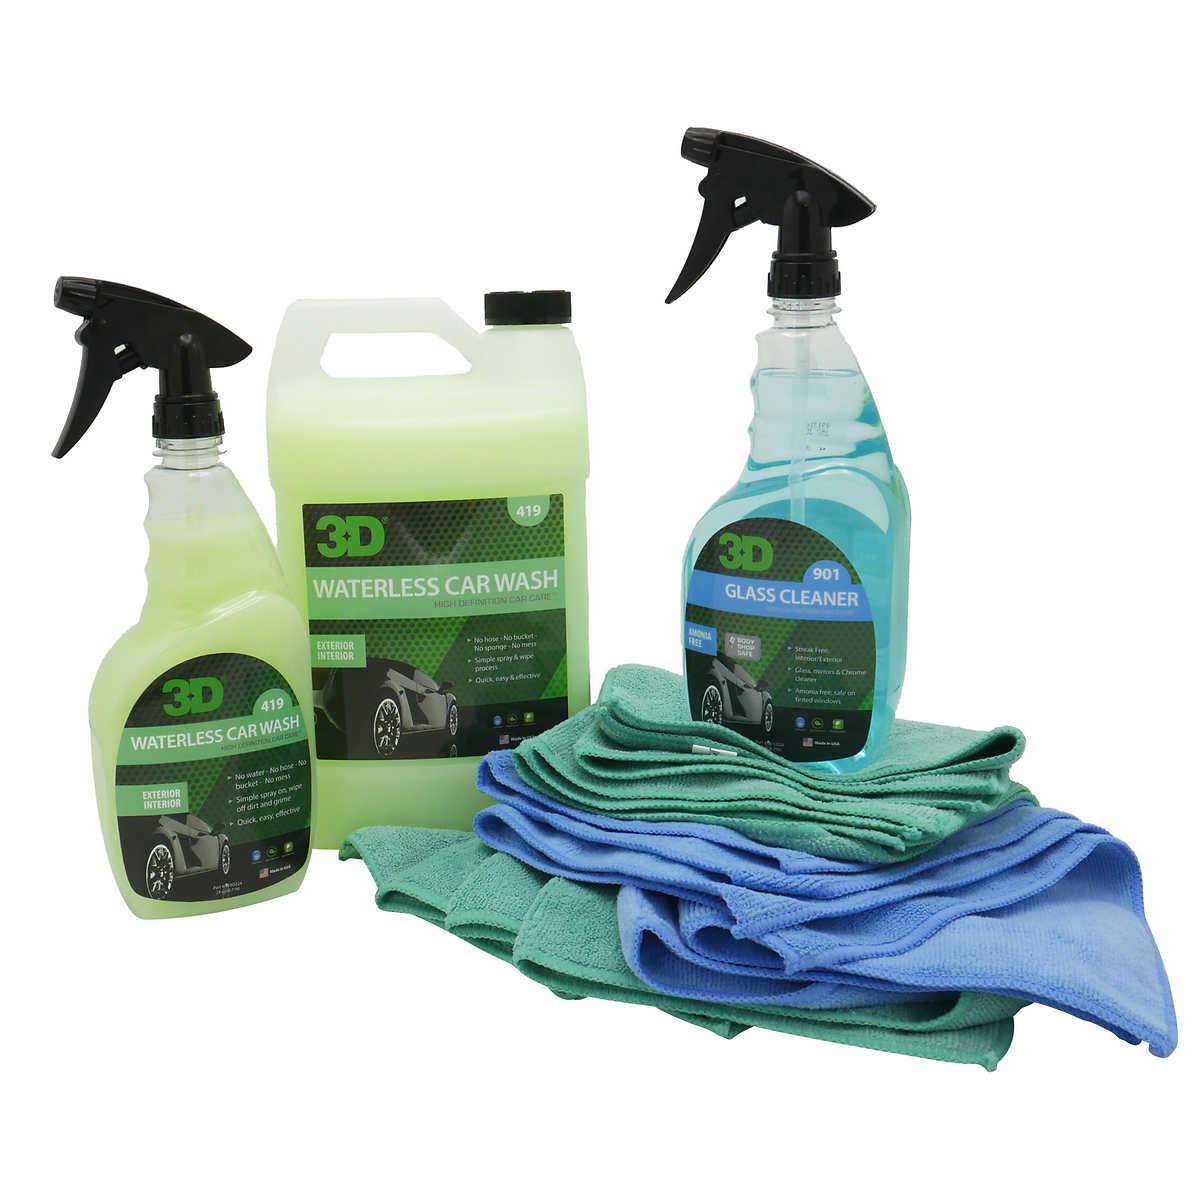 3d waterless kit